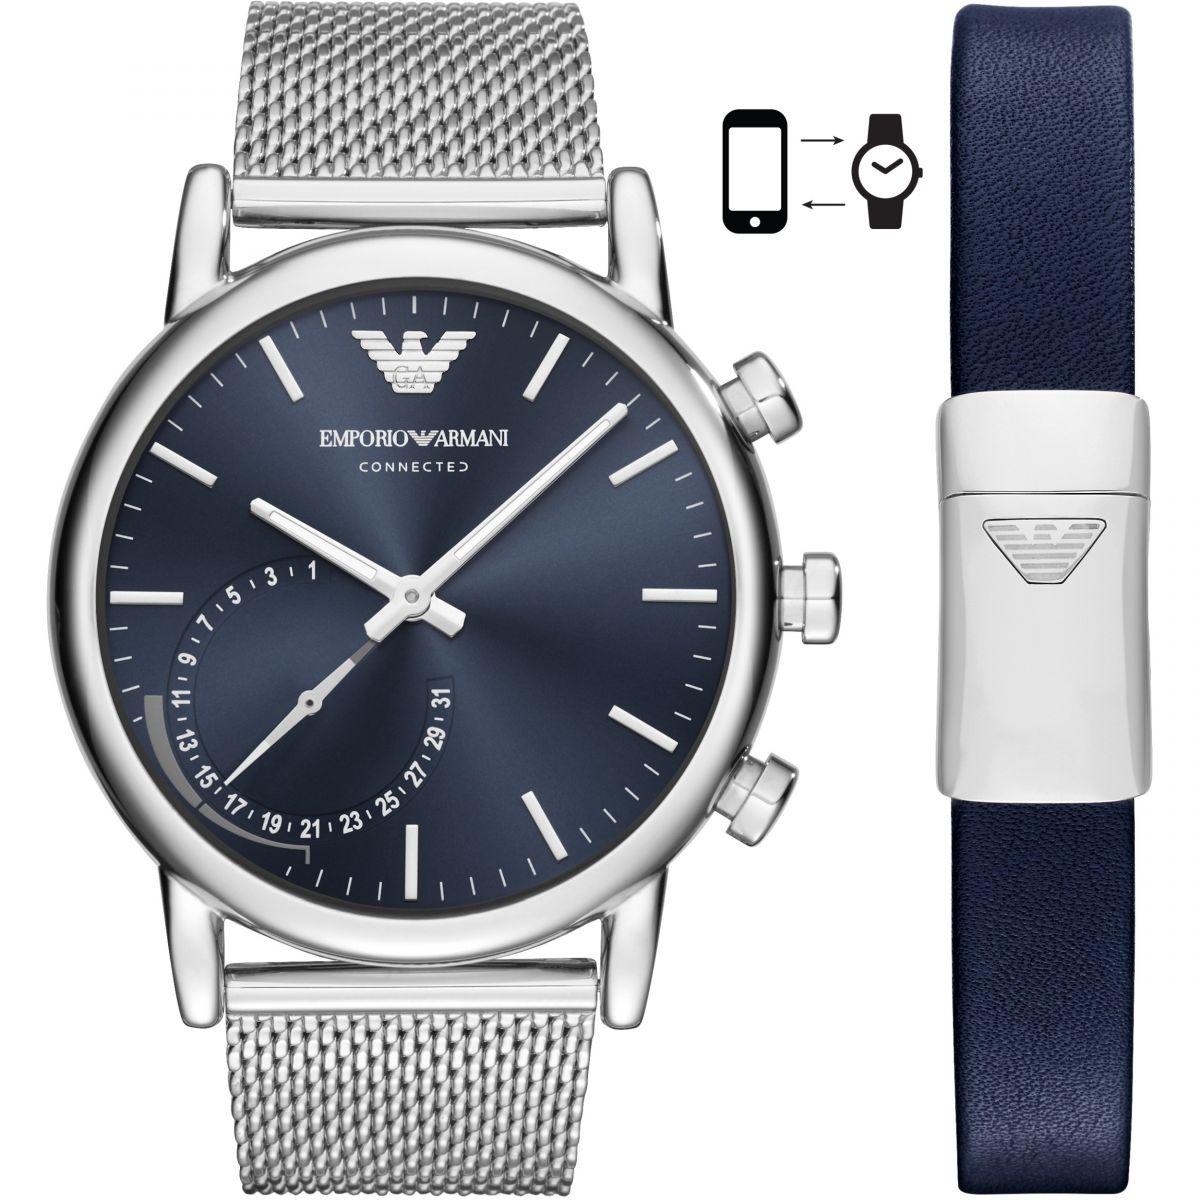 Emporio Armani Connected Watch (ART9003)